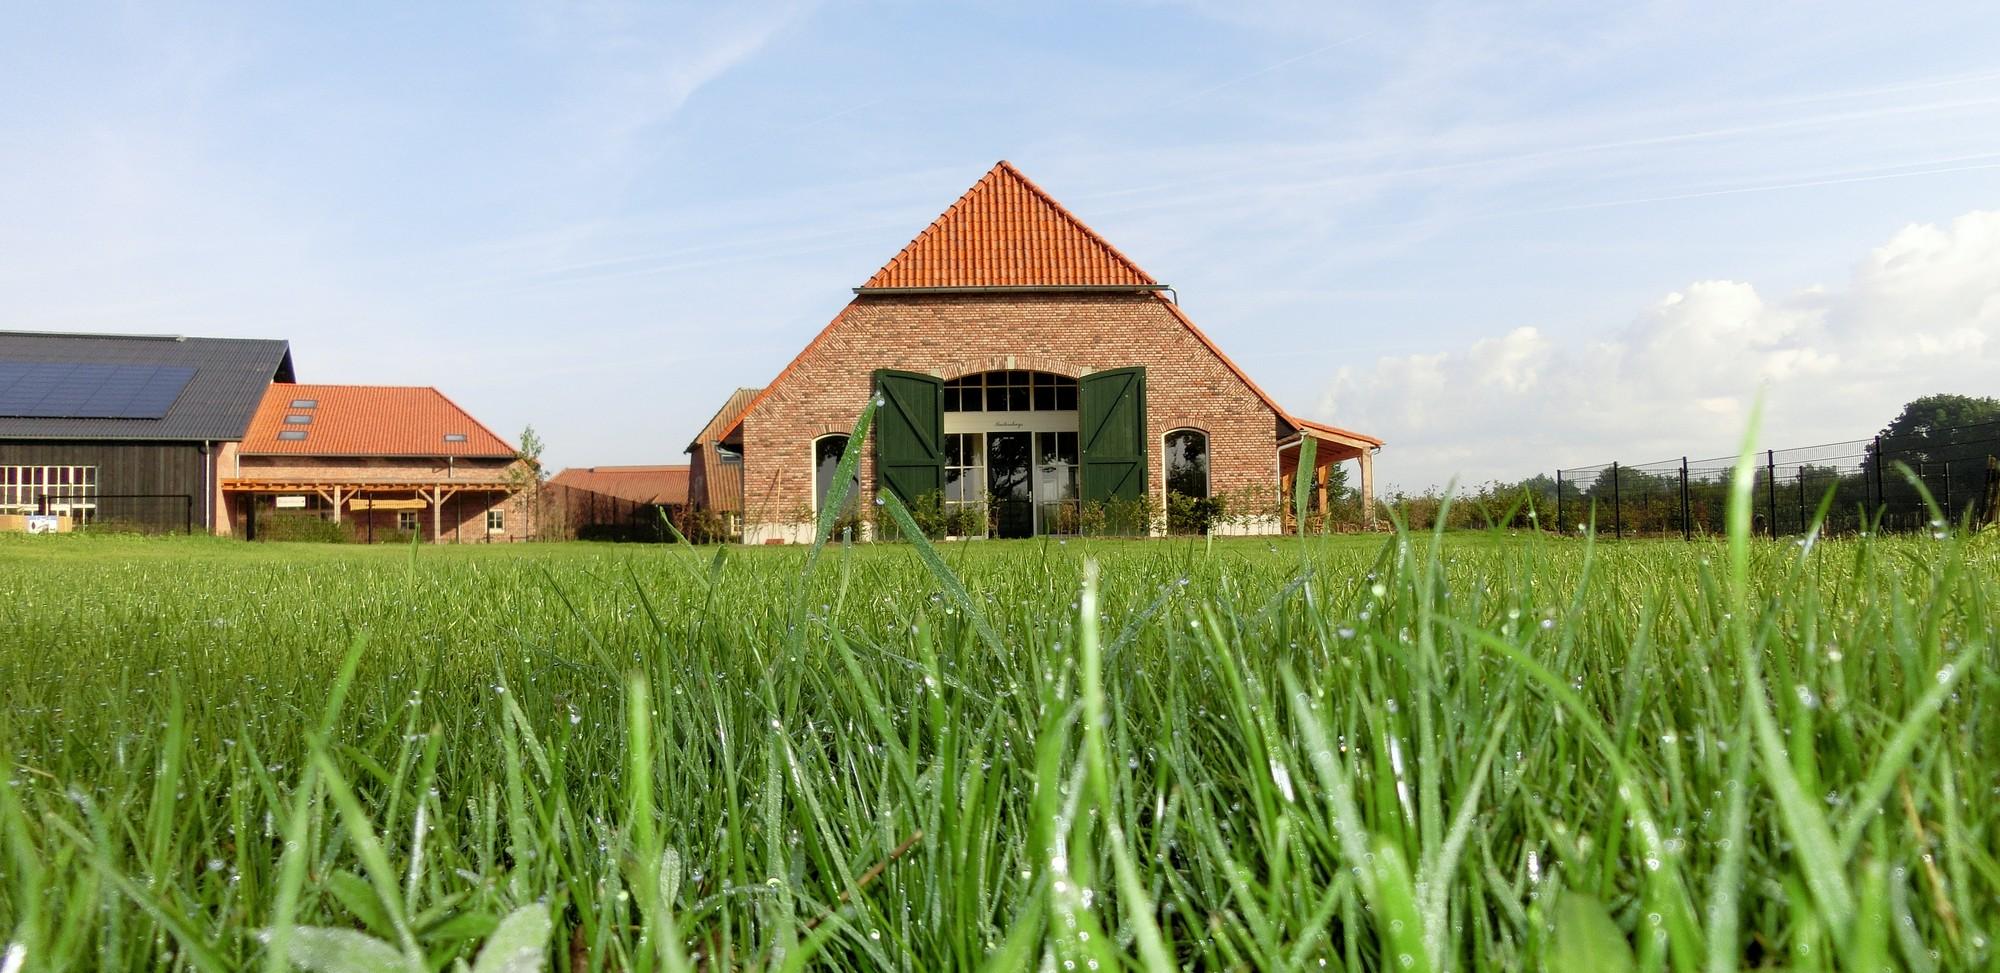 Landduin_Het-Buitenhuys_slider-1